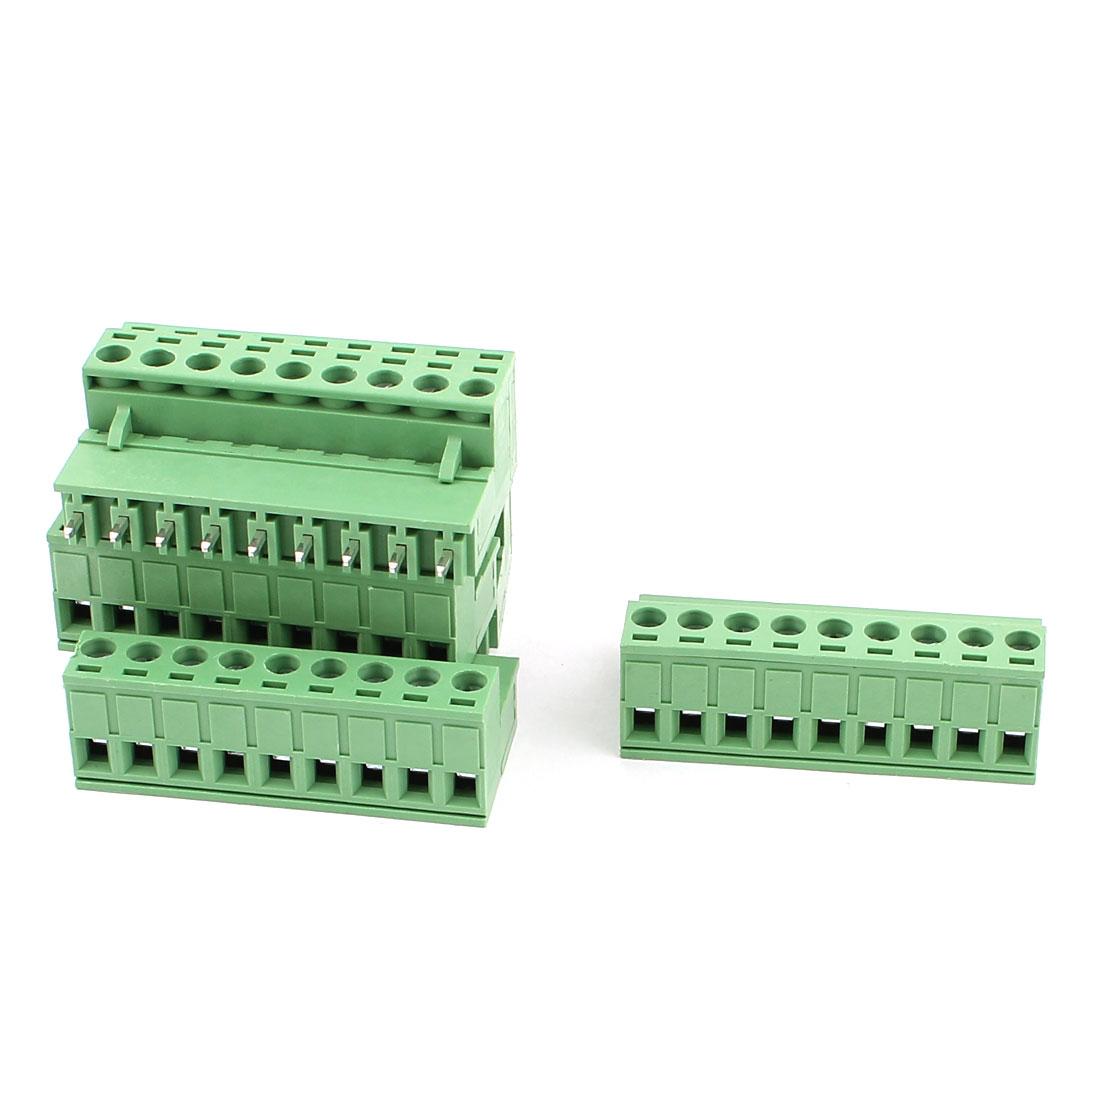 6 Pcs AC 300V 10A 9 Pins PCB Screw Terminal Block Connector 5.08mm Pitch Green